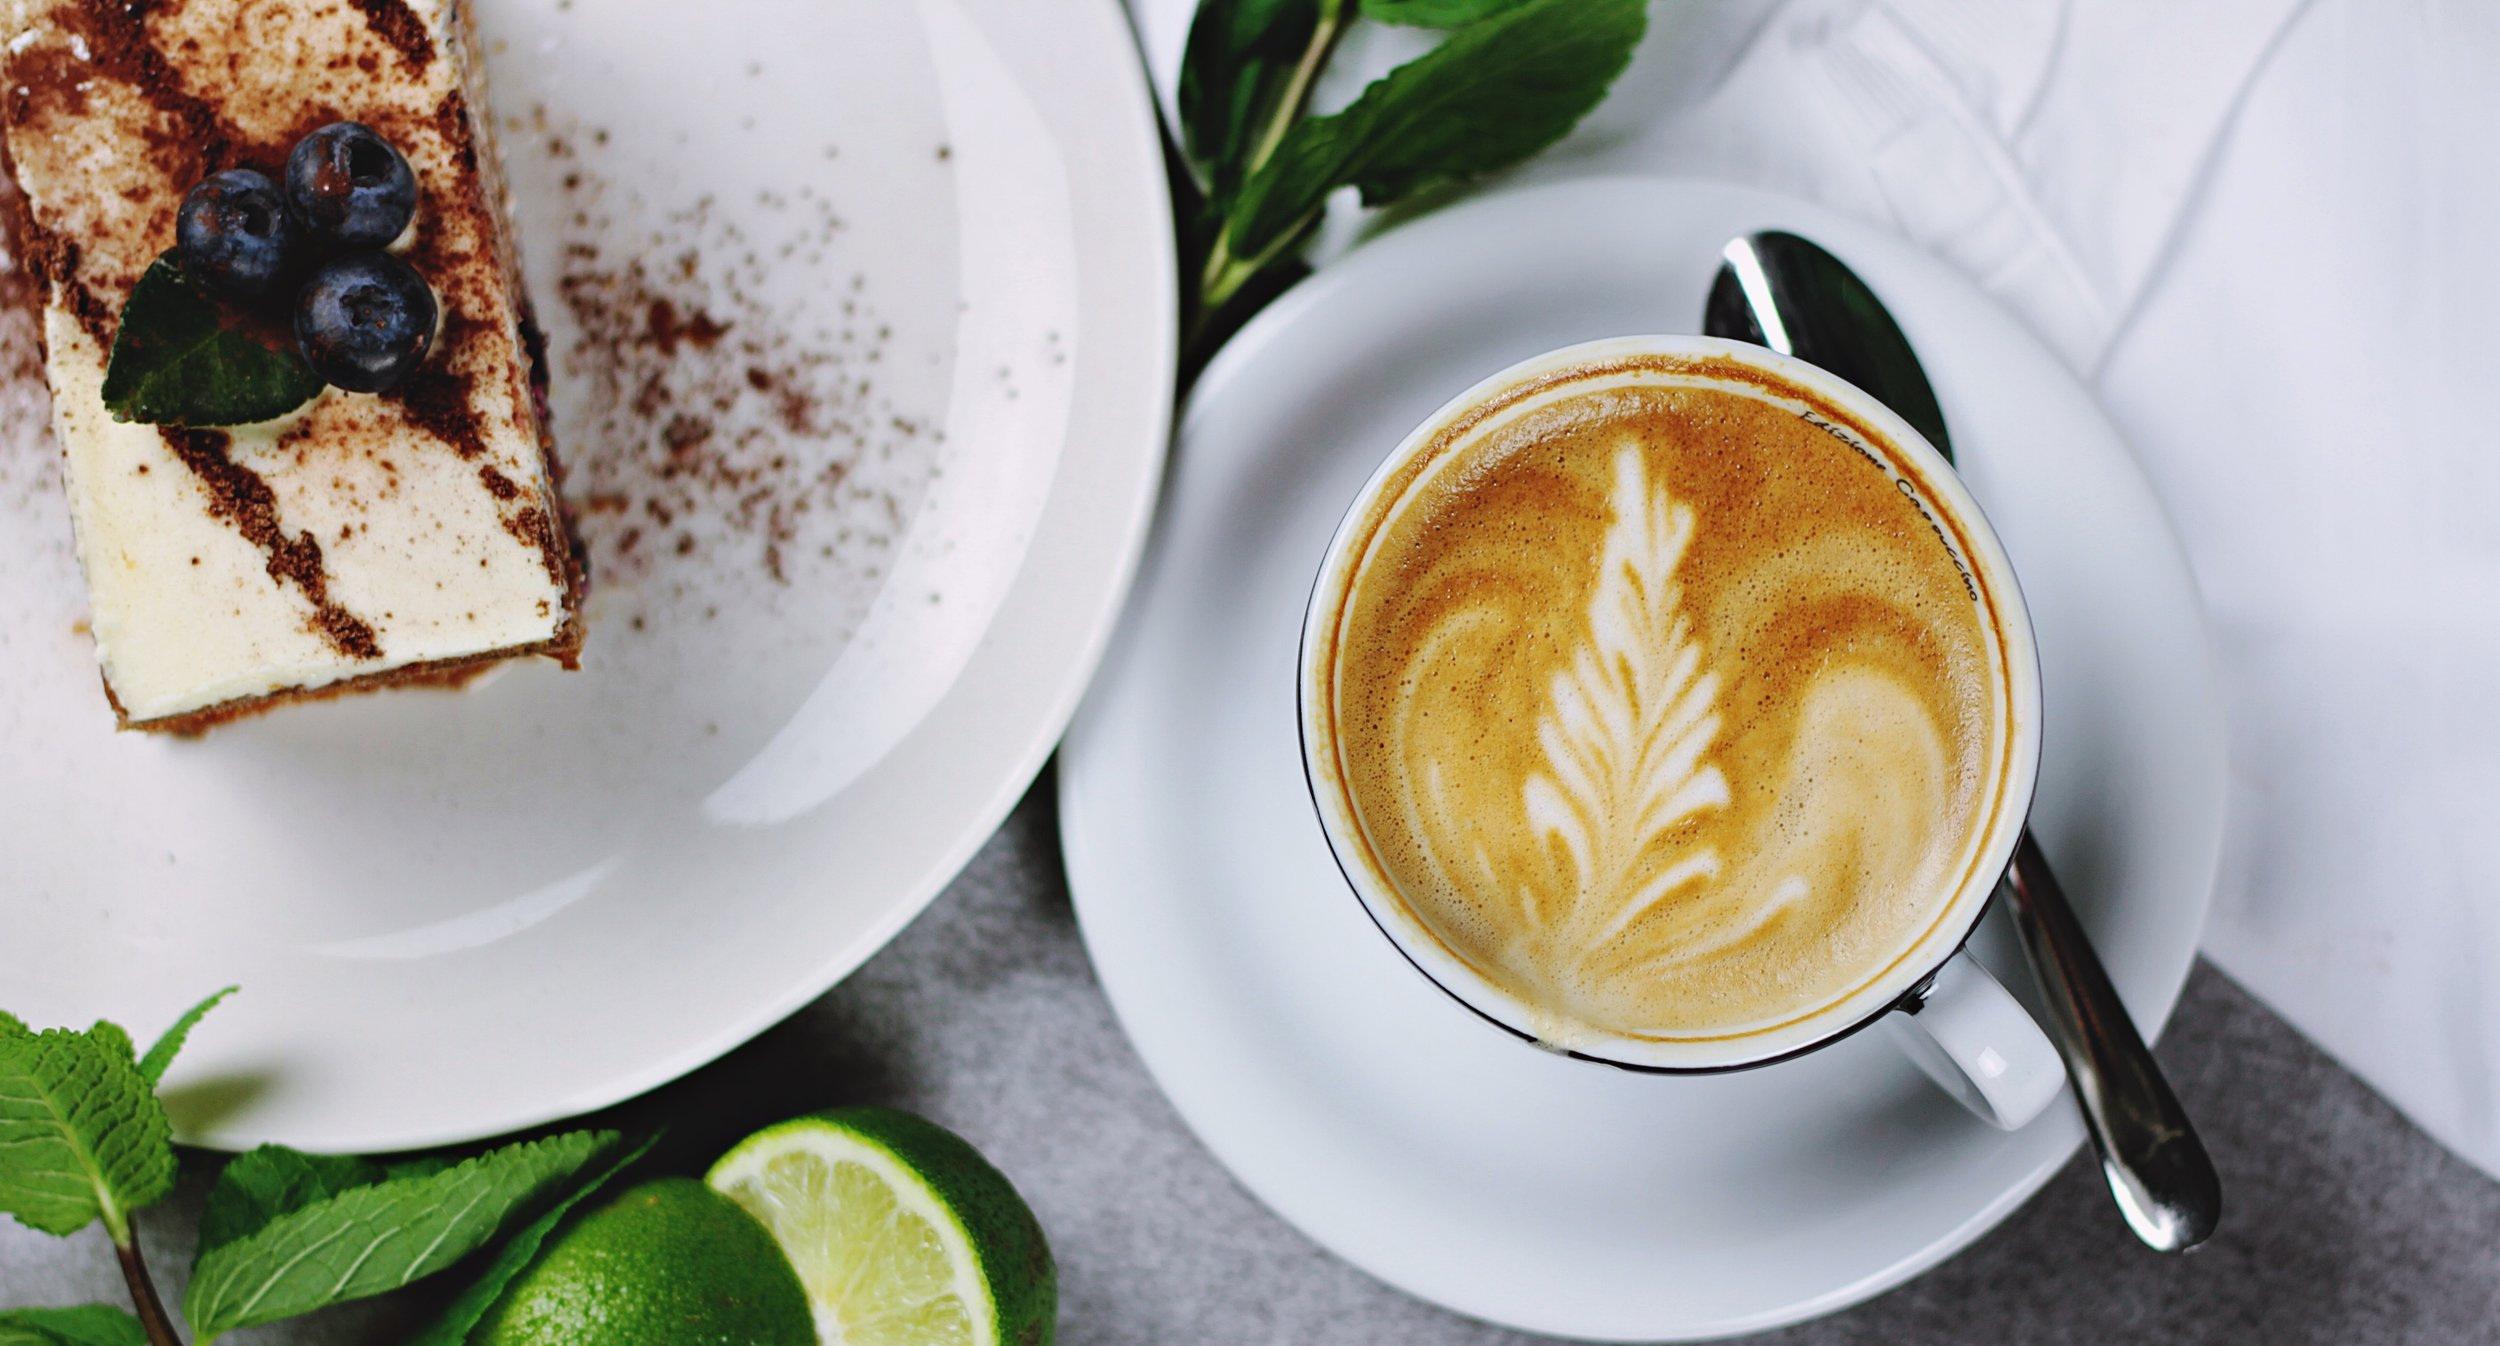 Tiramisu and cappuccino